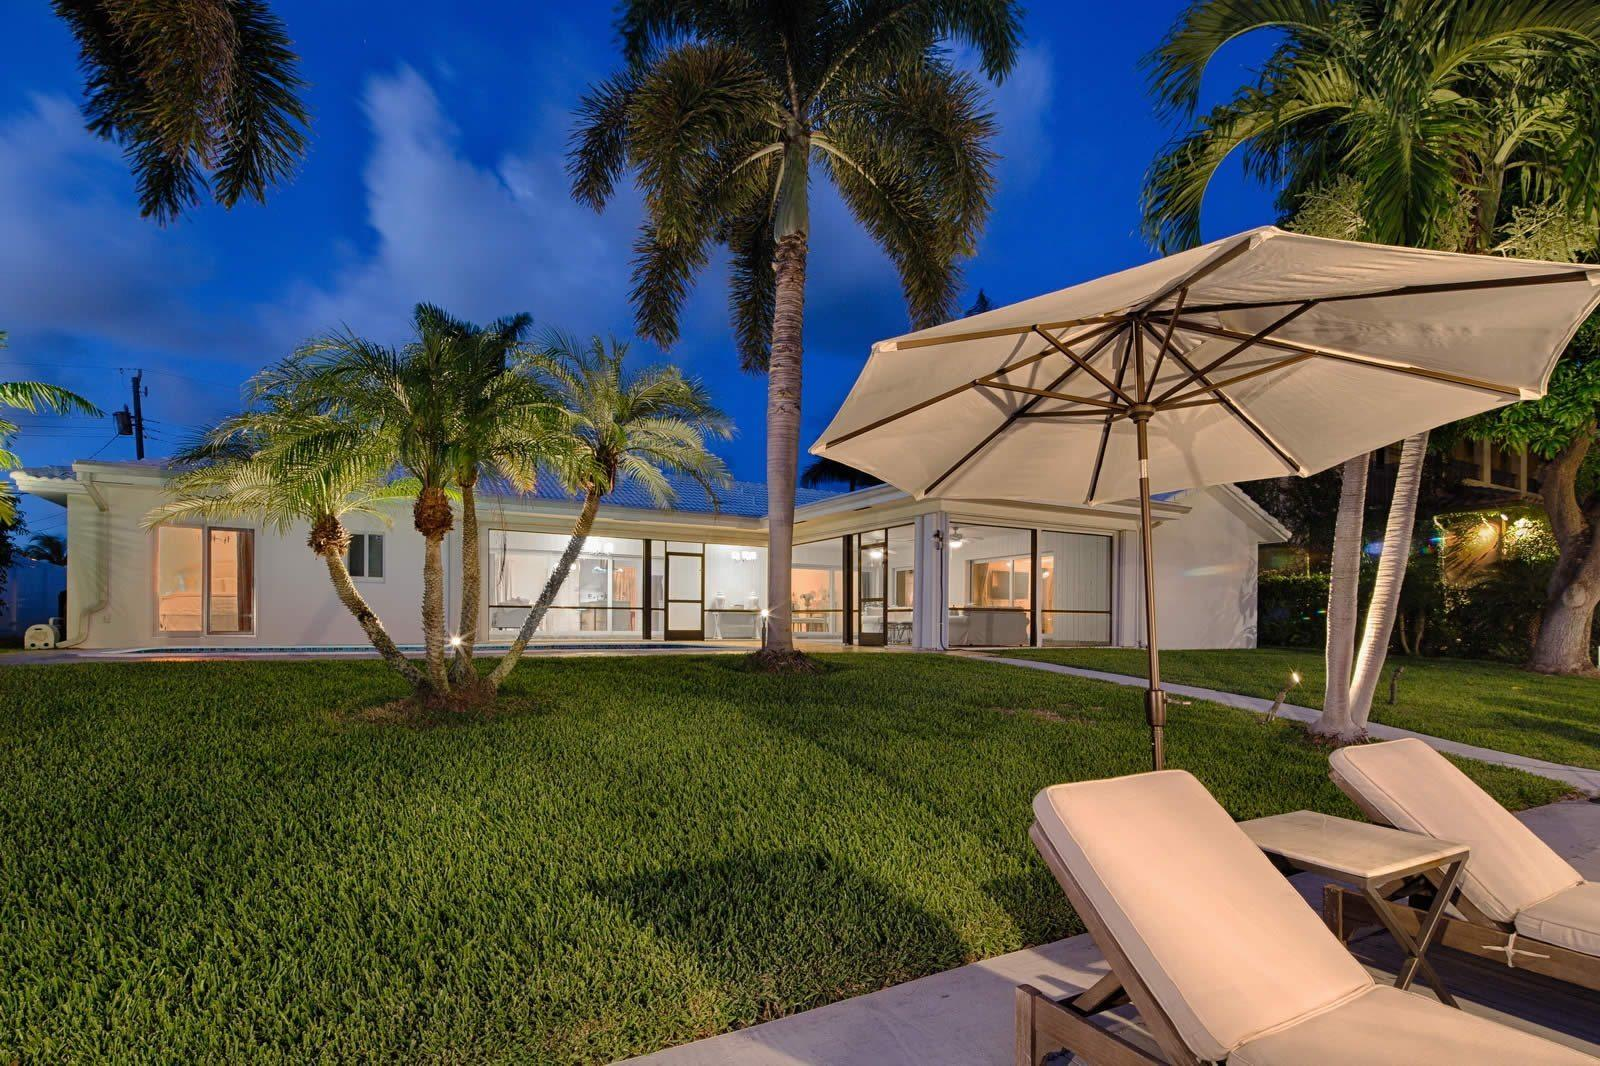 villa-for-sale-deerfield-beach-renovated-house-pool-ocean-access